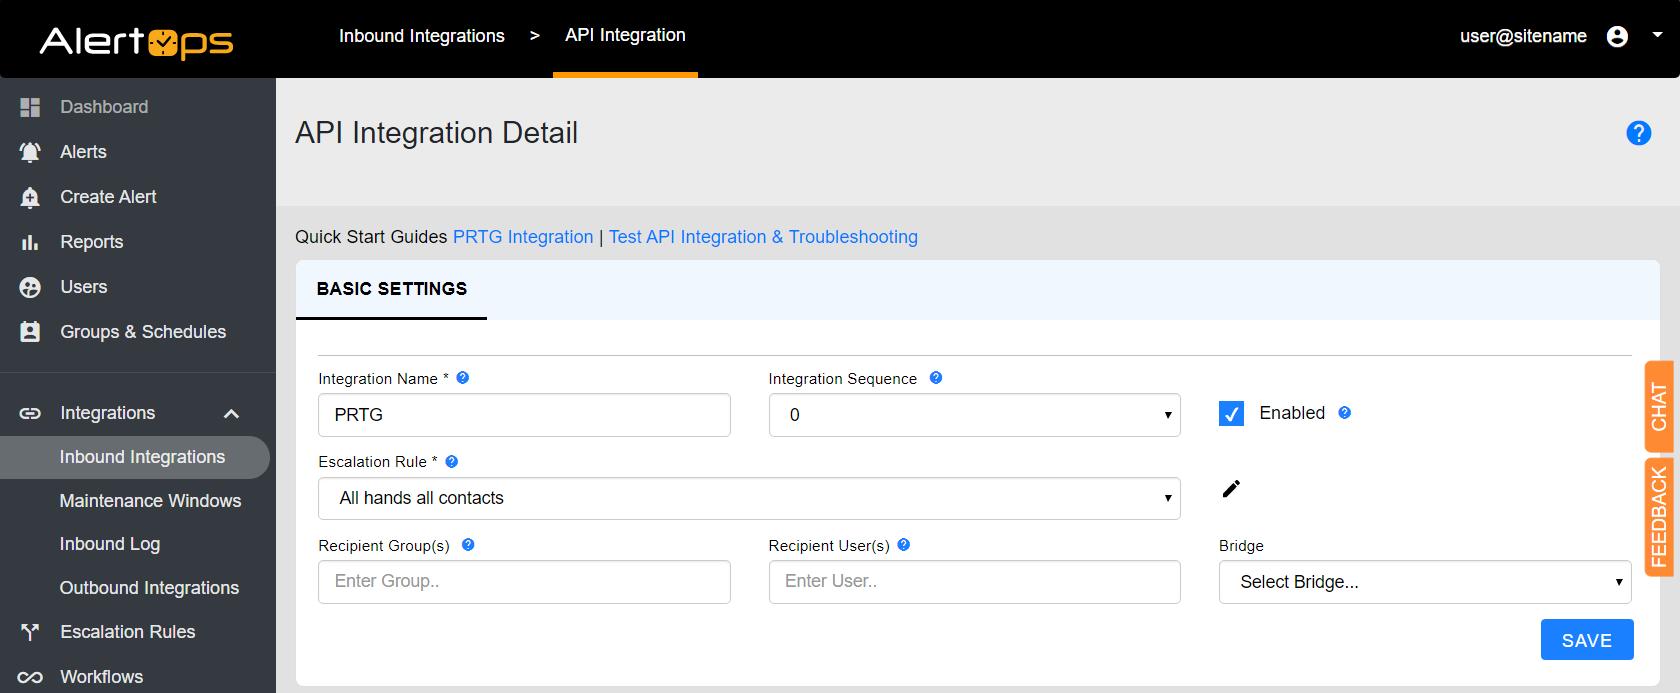 Configure API integration in AlertOps